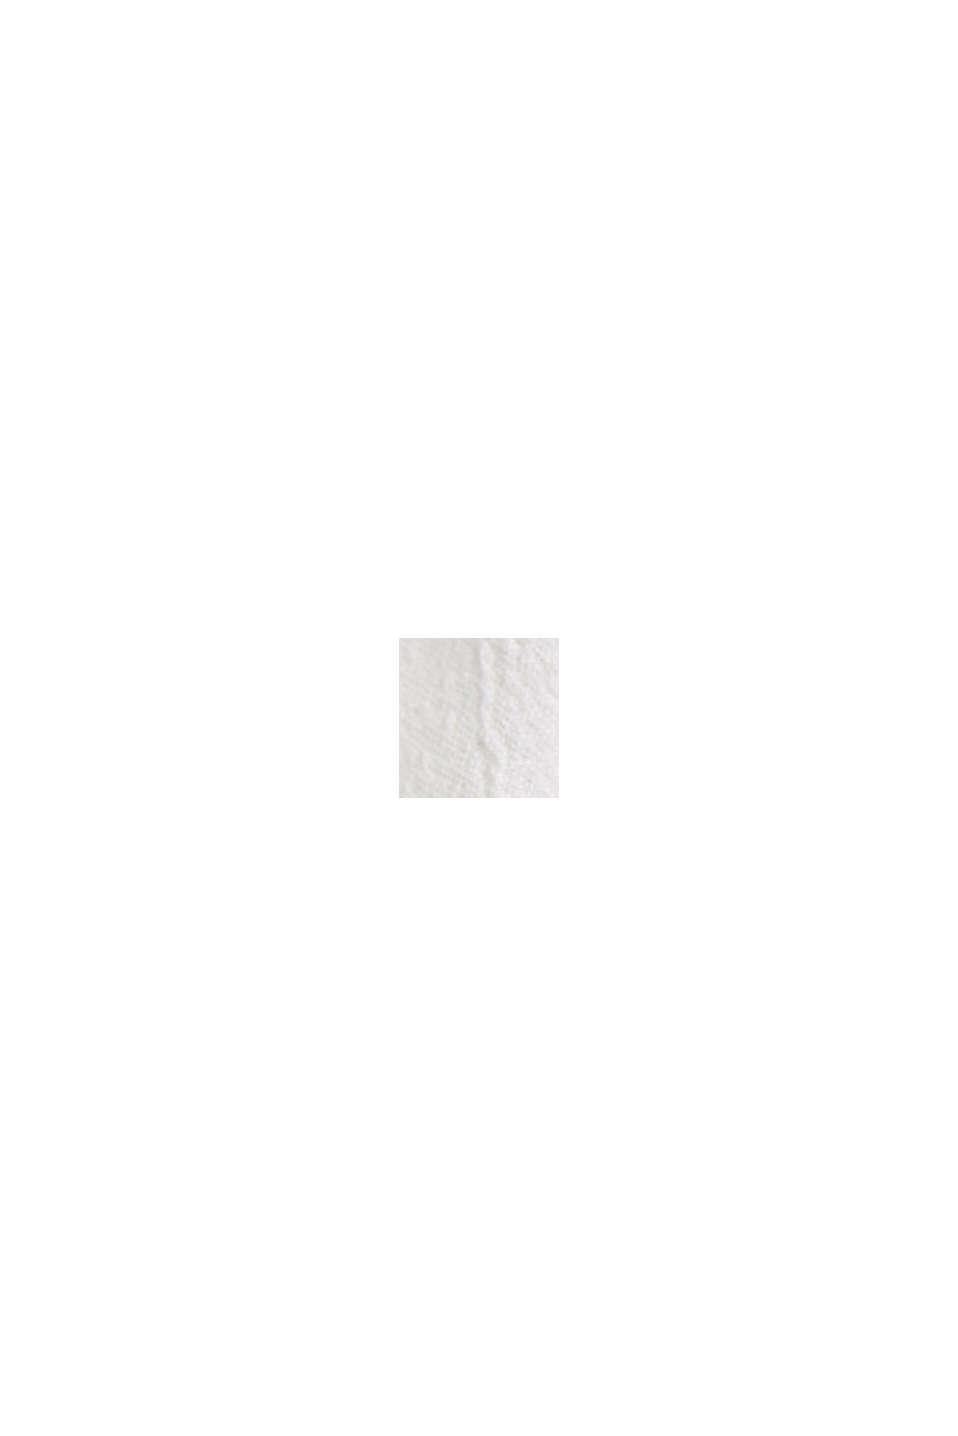 CURVY blouse van LENZING™ ECOVERO™, OFF WHITE, swatch